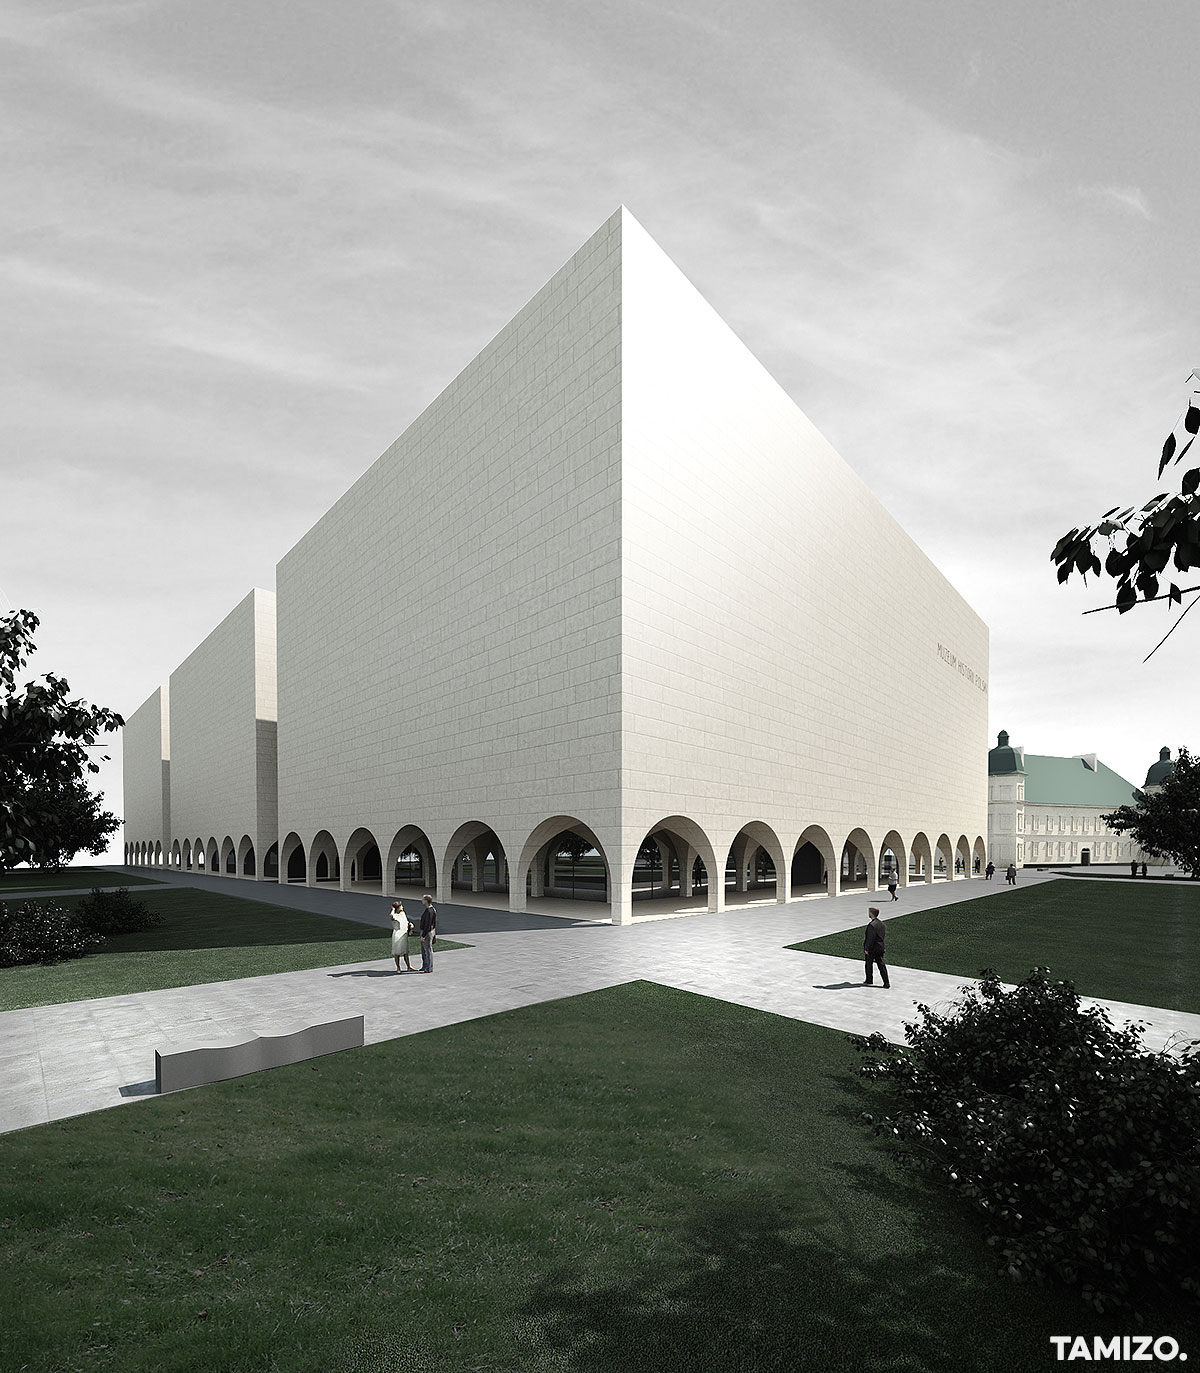 A037_tamizo_architekci_projekt_konkurs_muzeum_historii_polski_02